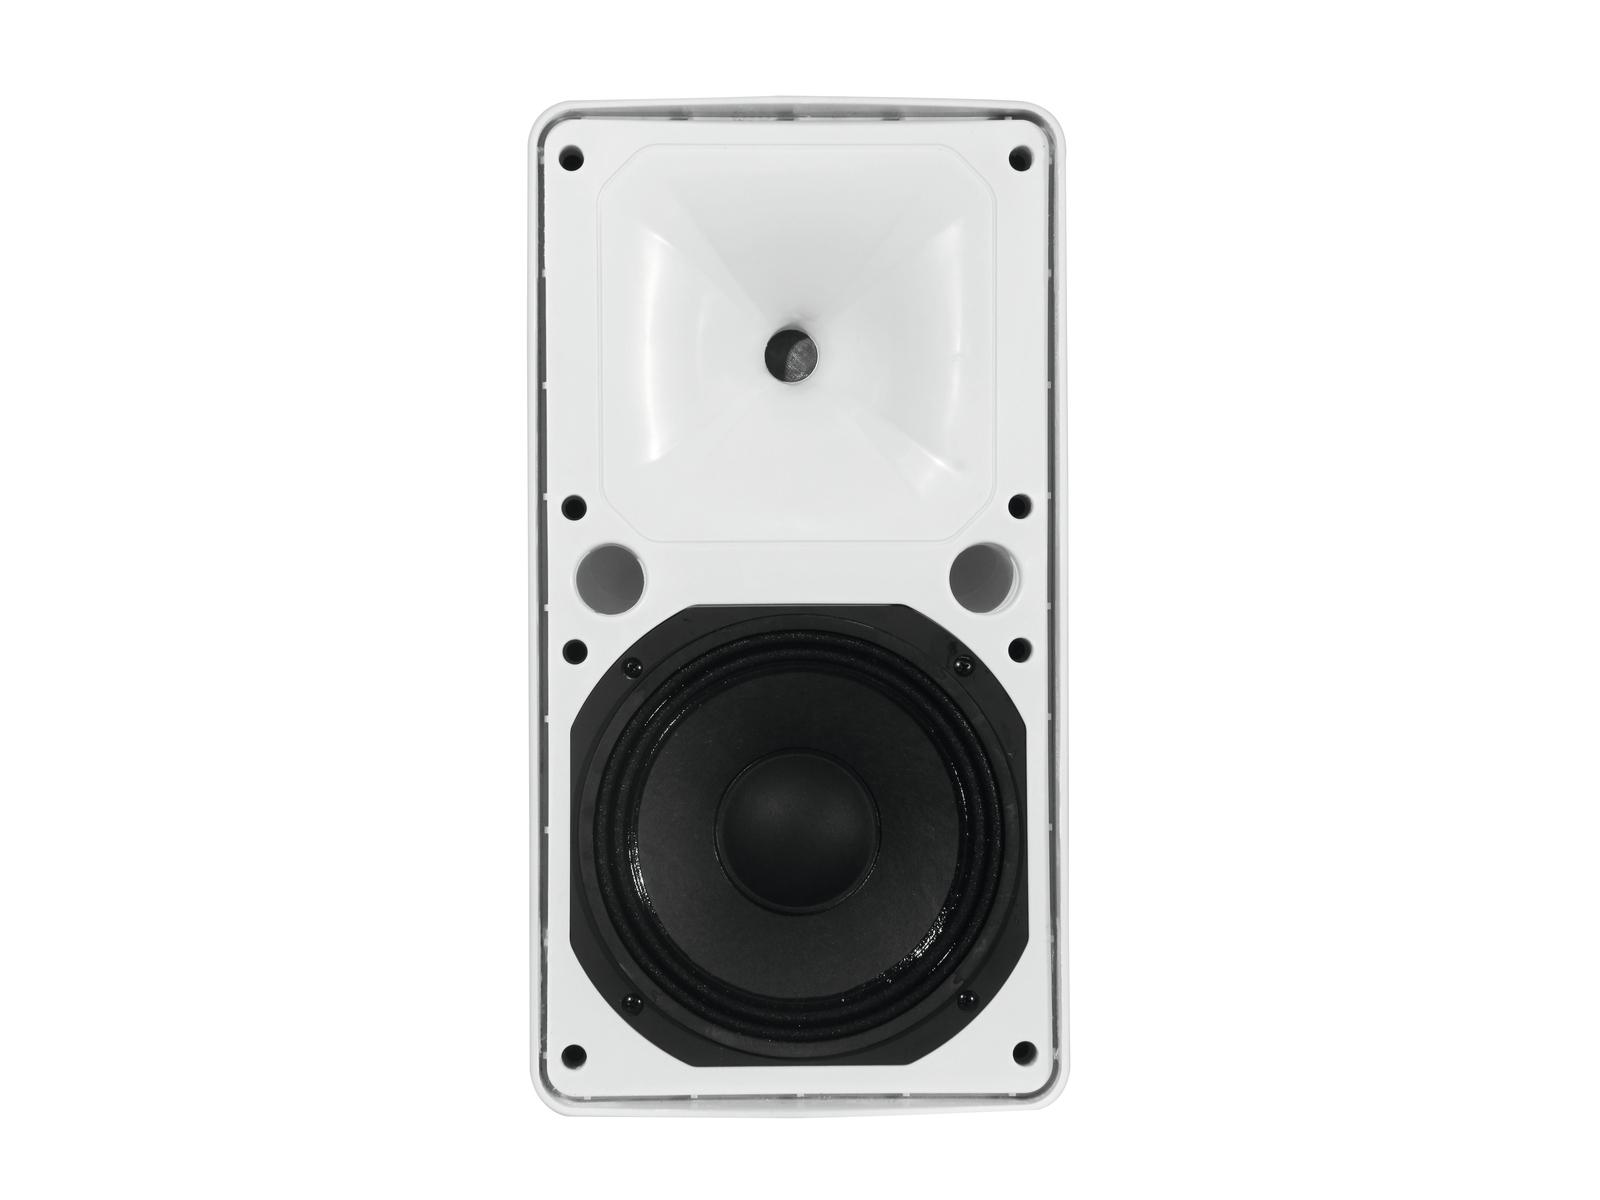 OMNITRONIC ODP-208 Installationslautsprecher 16 Ohm weiß